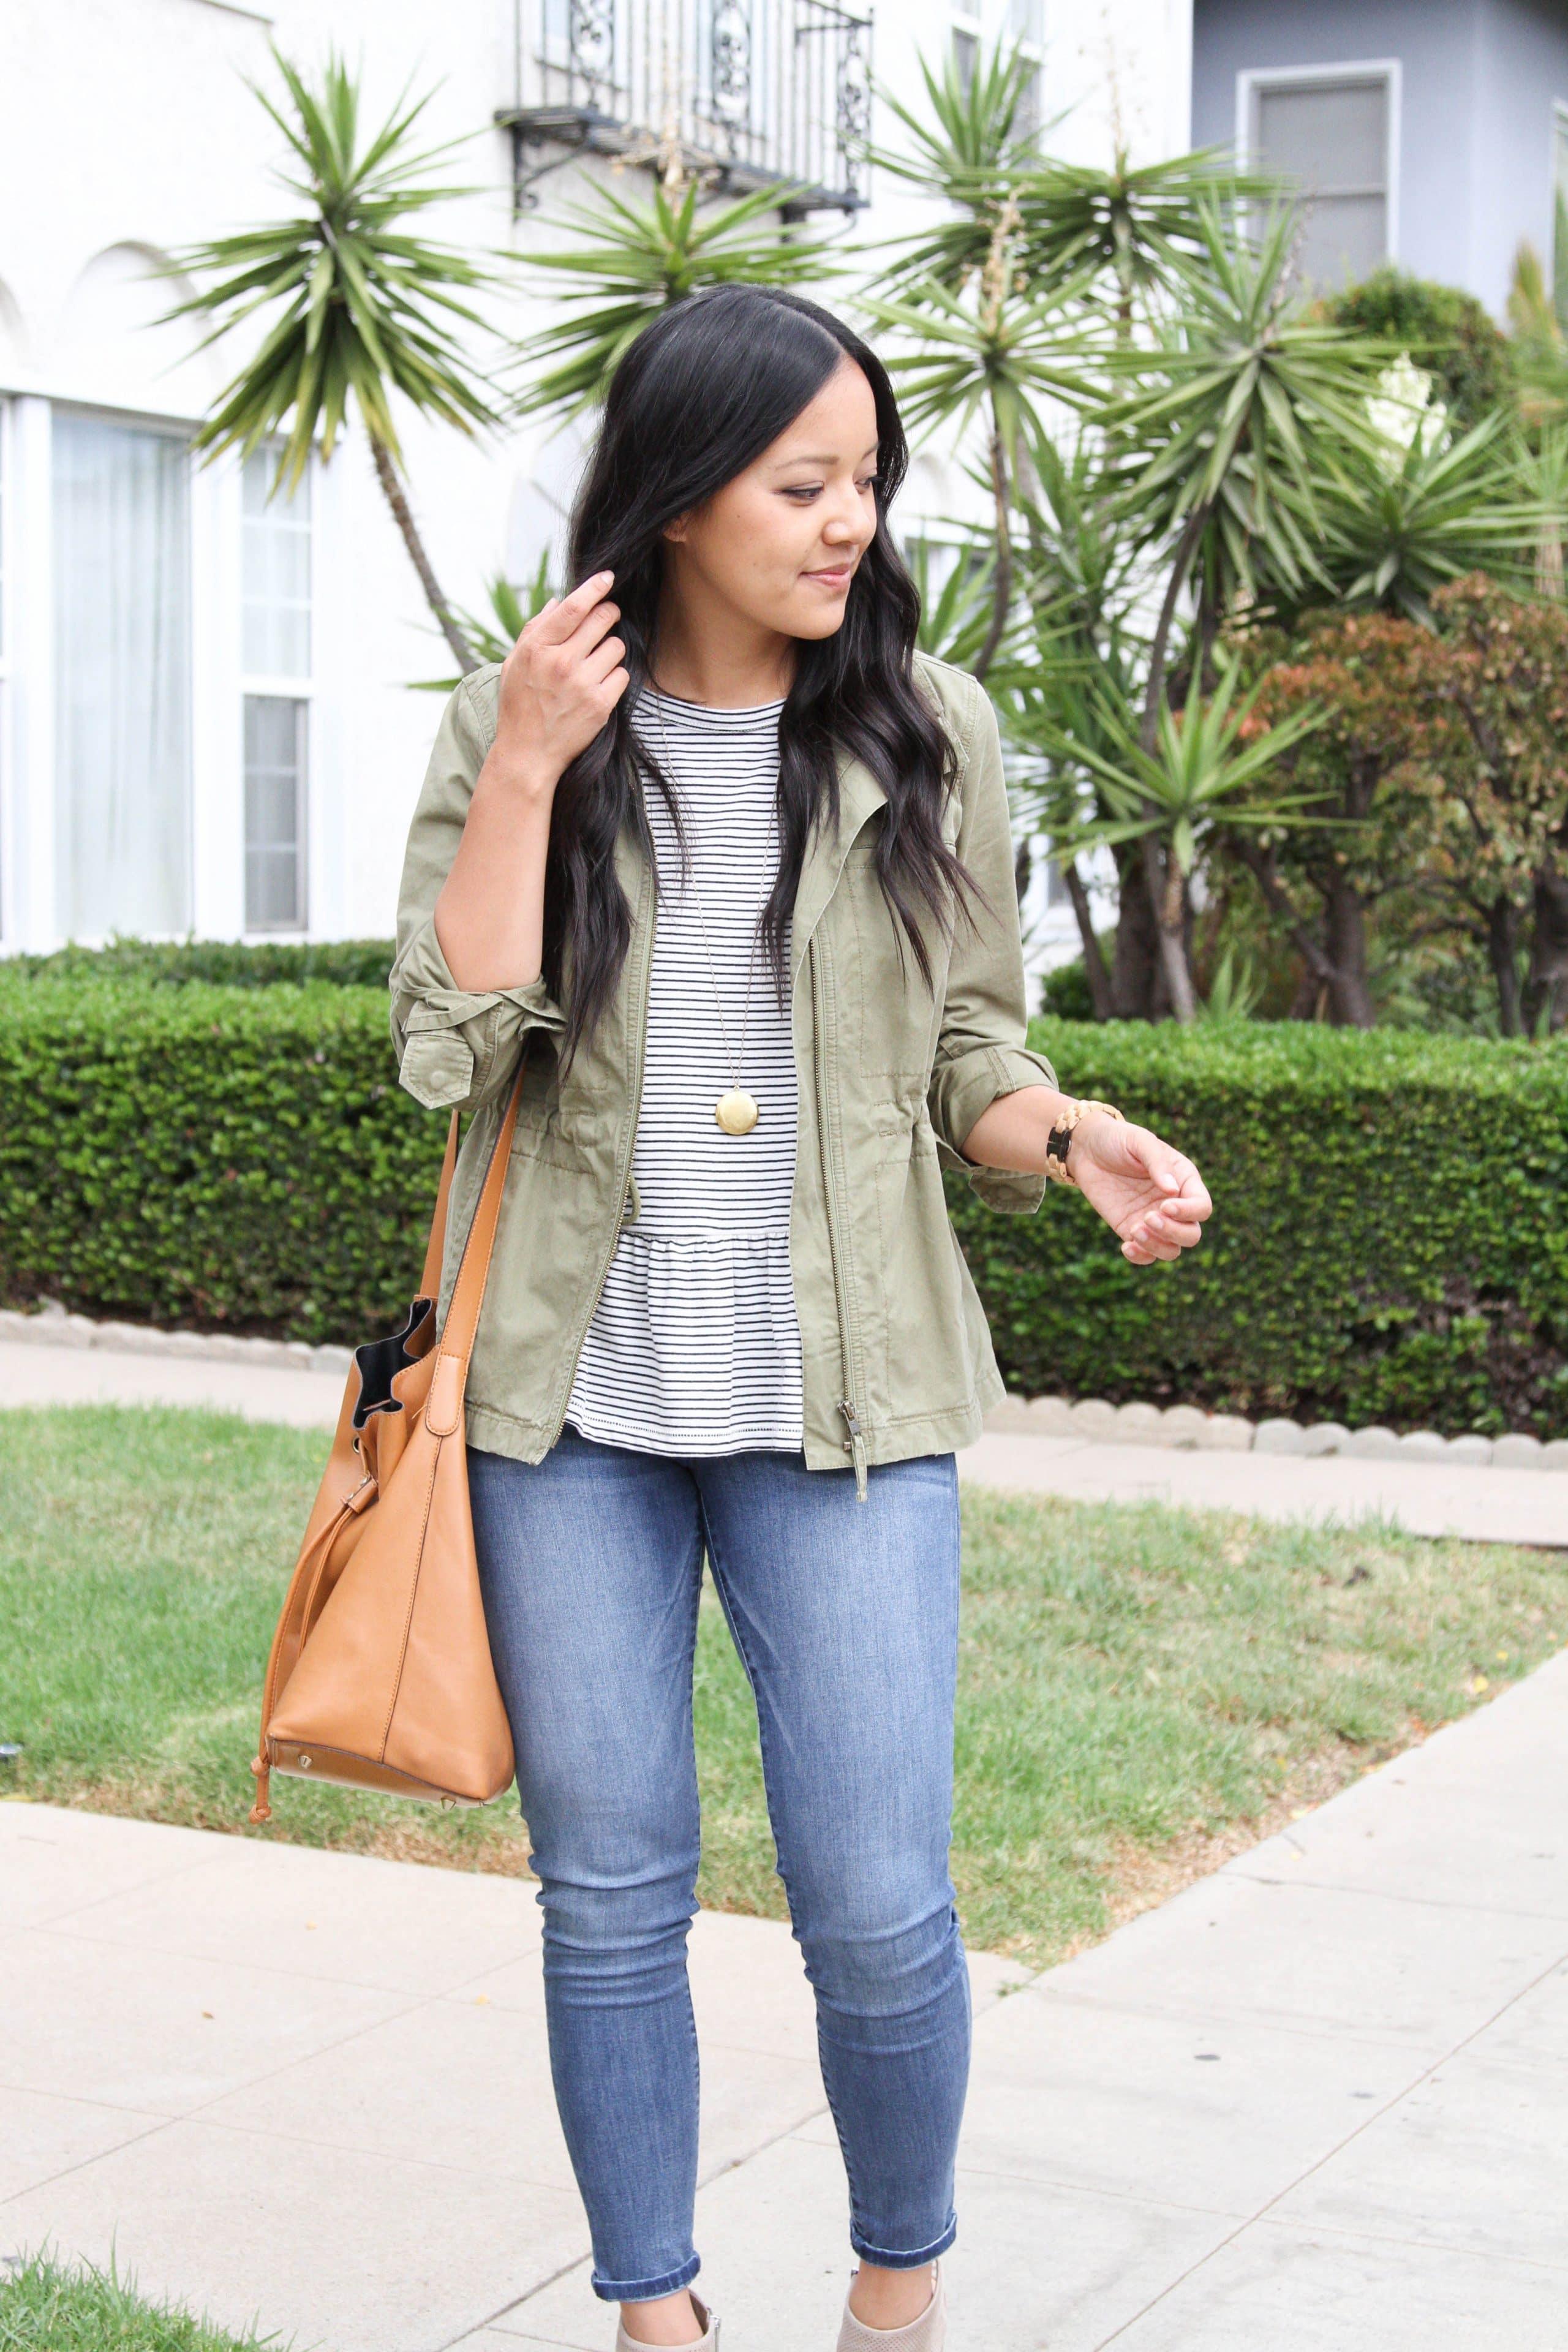 Utility Jacket + Striped Peplum + Light Jeans + Tan Bag + Gold Pendant